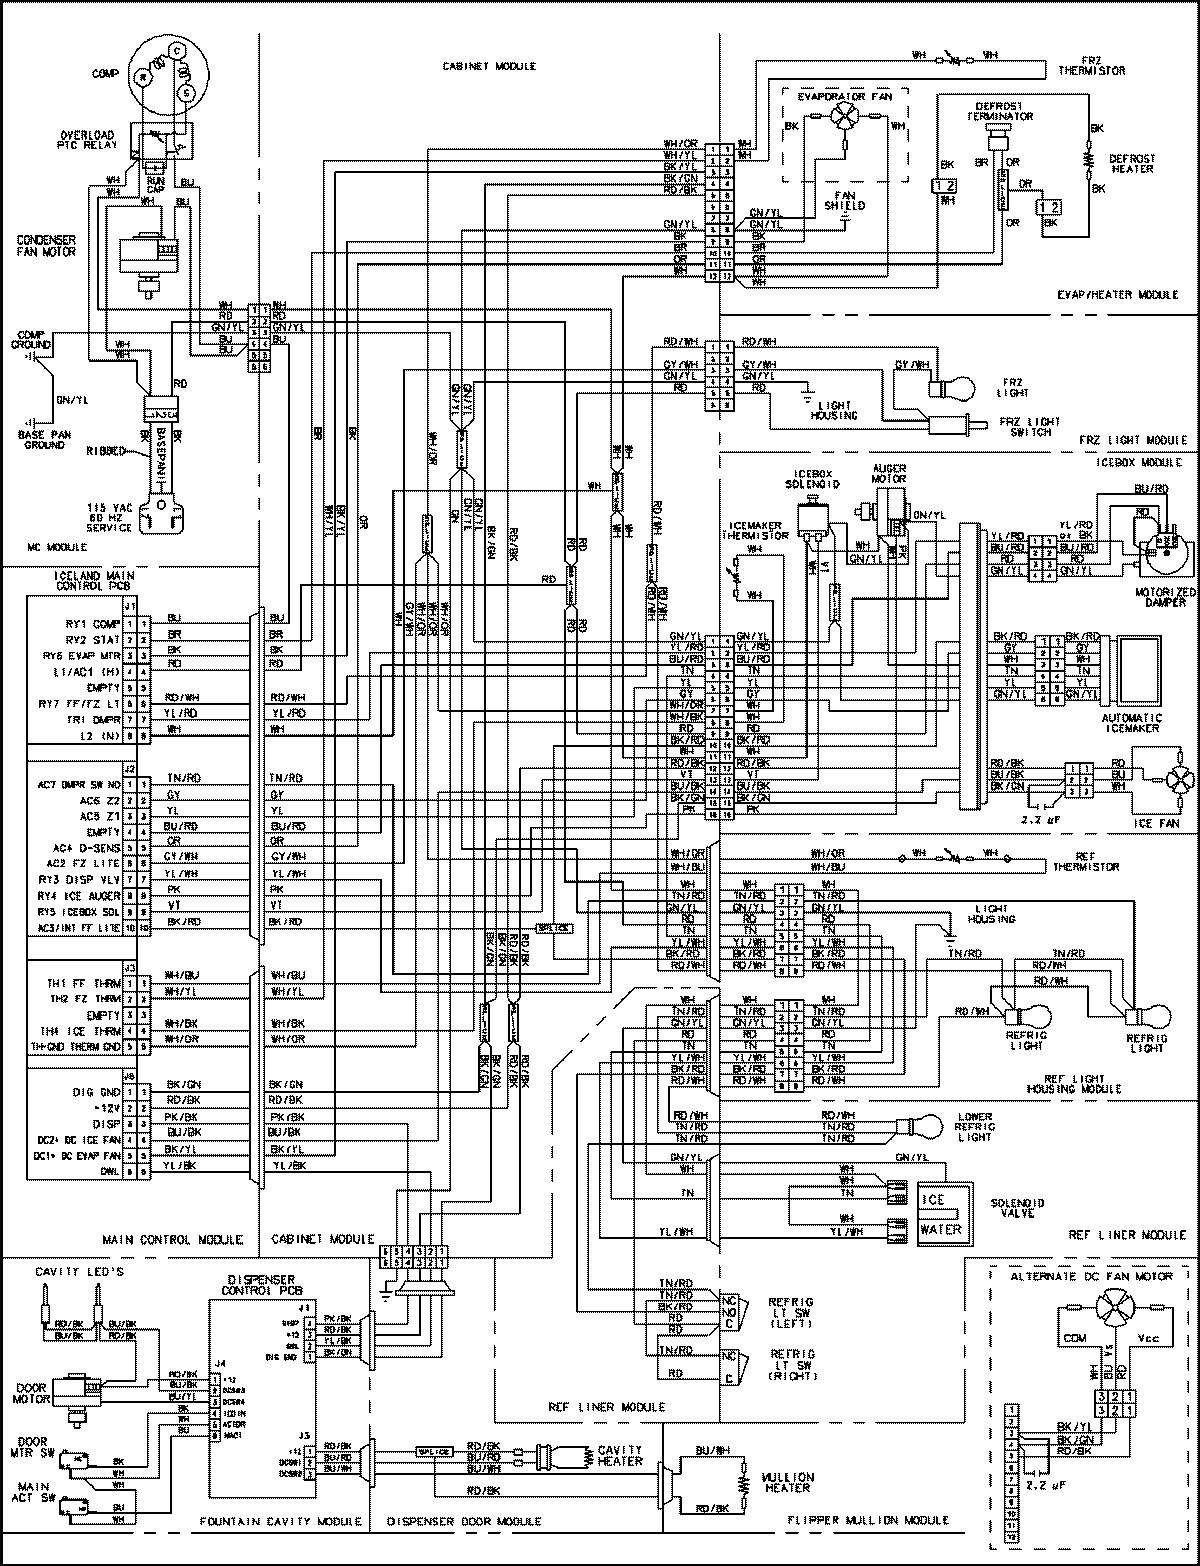 Hotpoint Dryer Wiring Diagram Washing Machine Motor Aquarius Best Image 2018 On